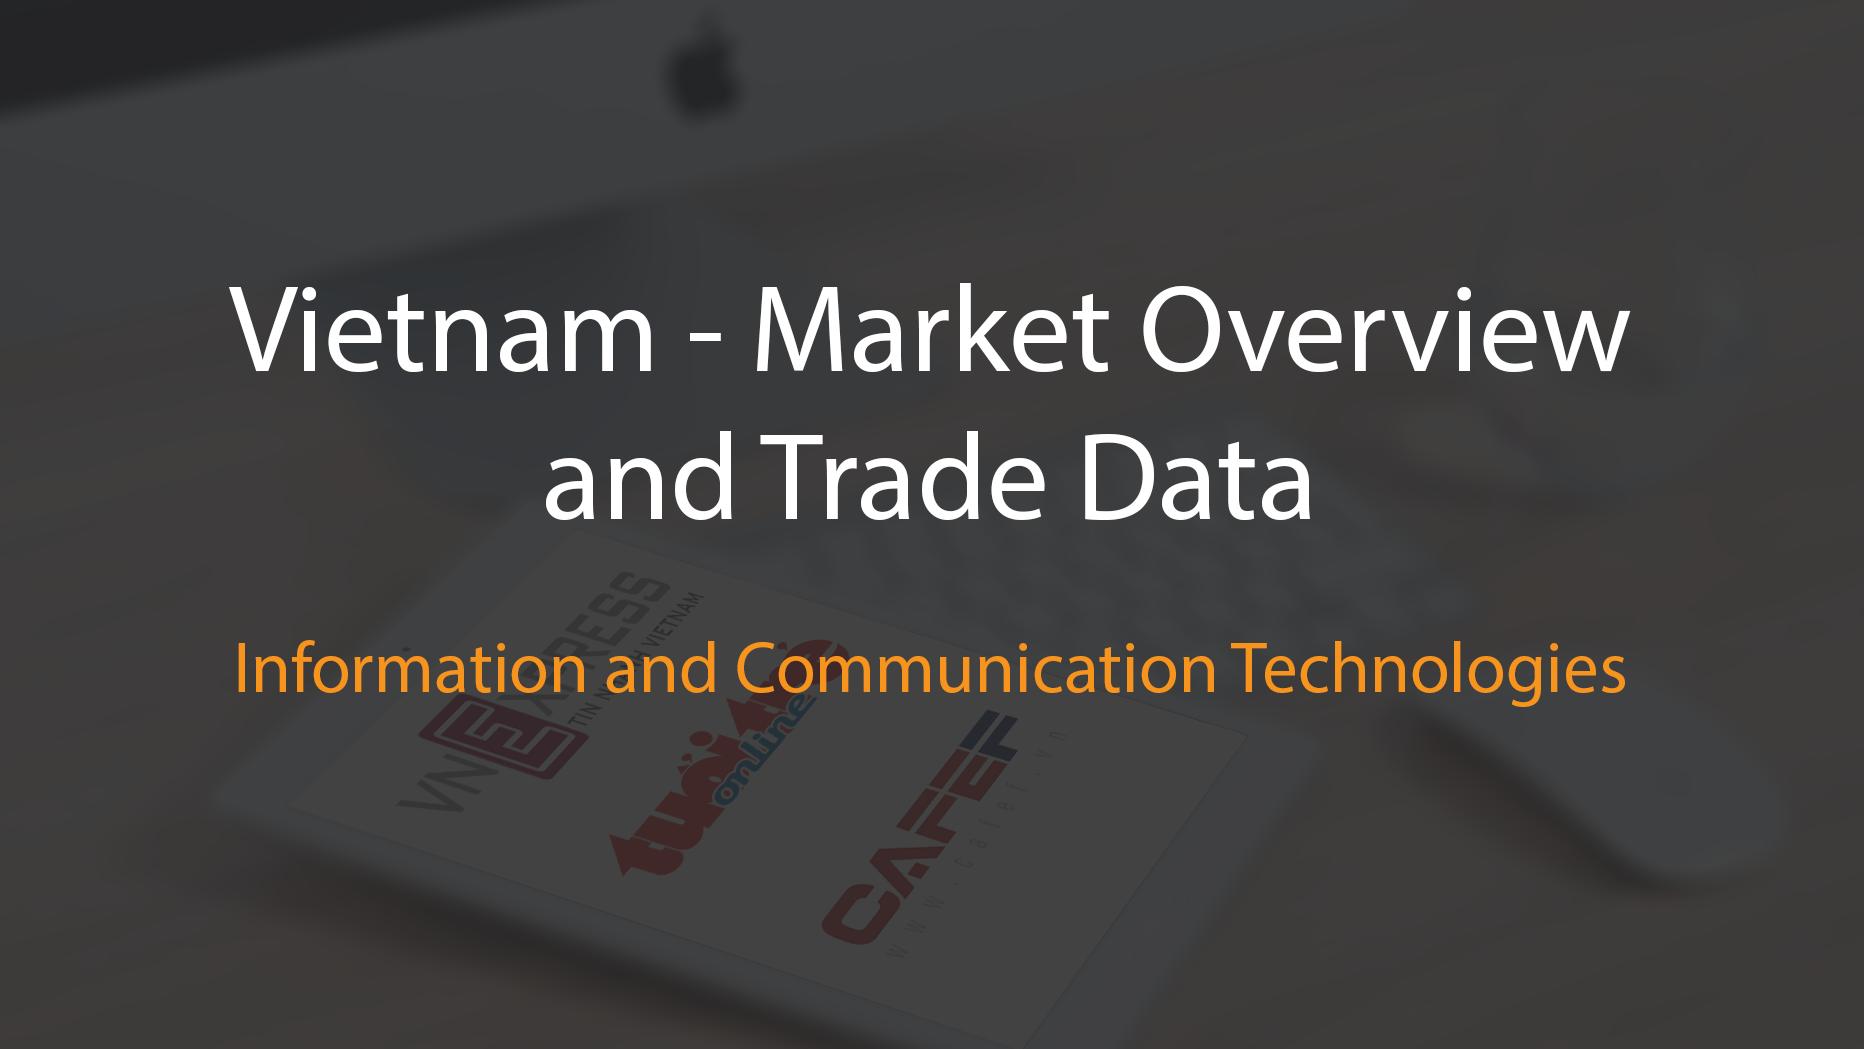 Vietnam internet communication technology market overview